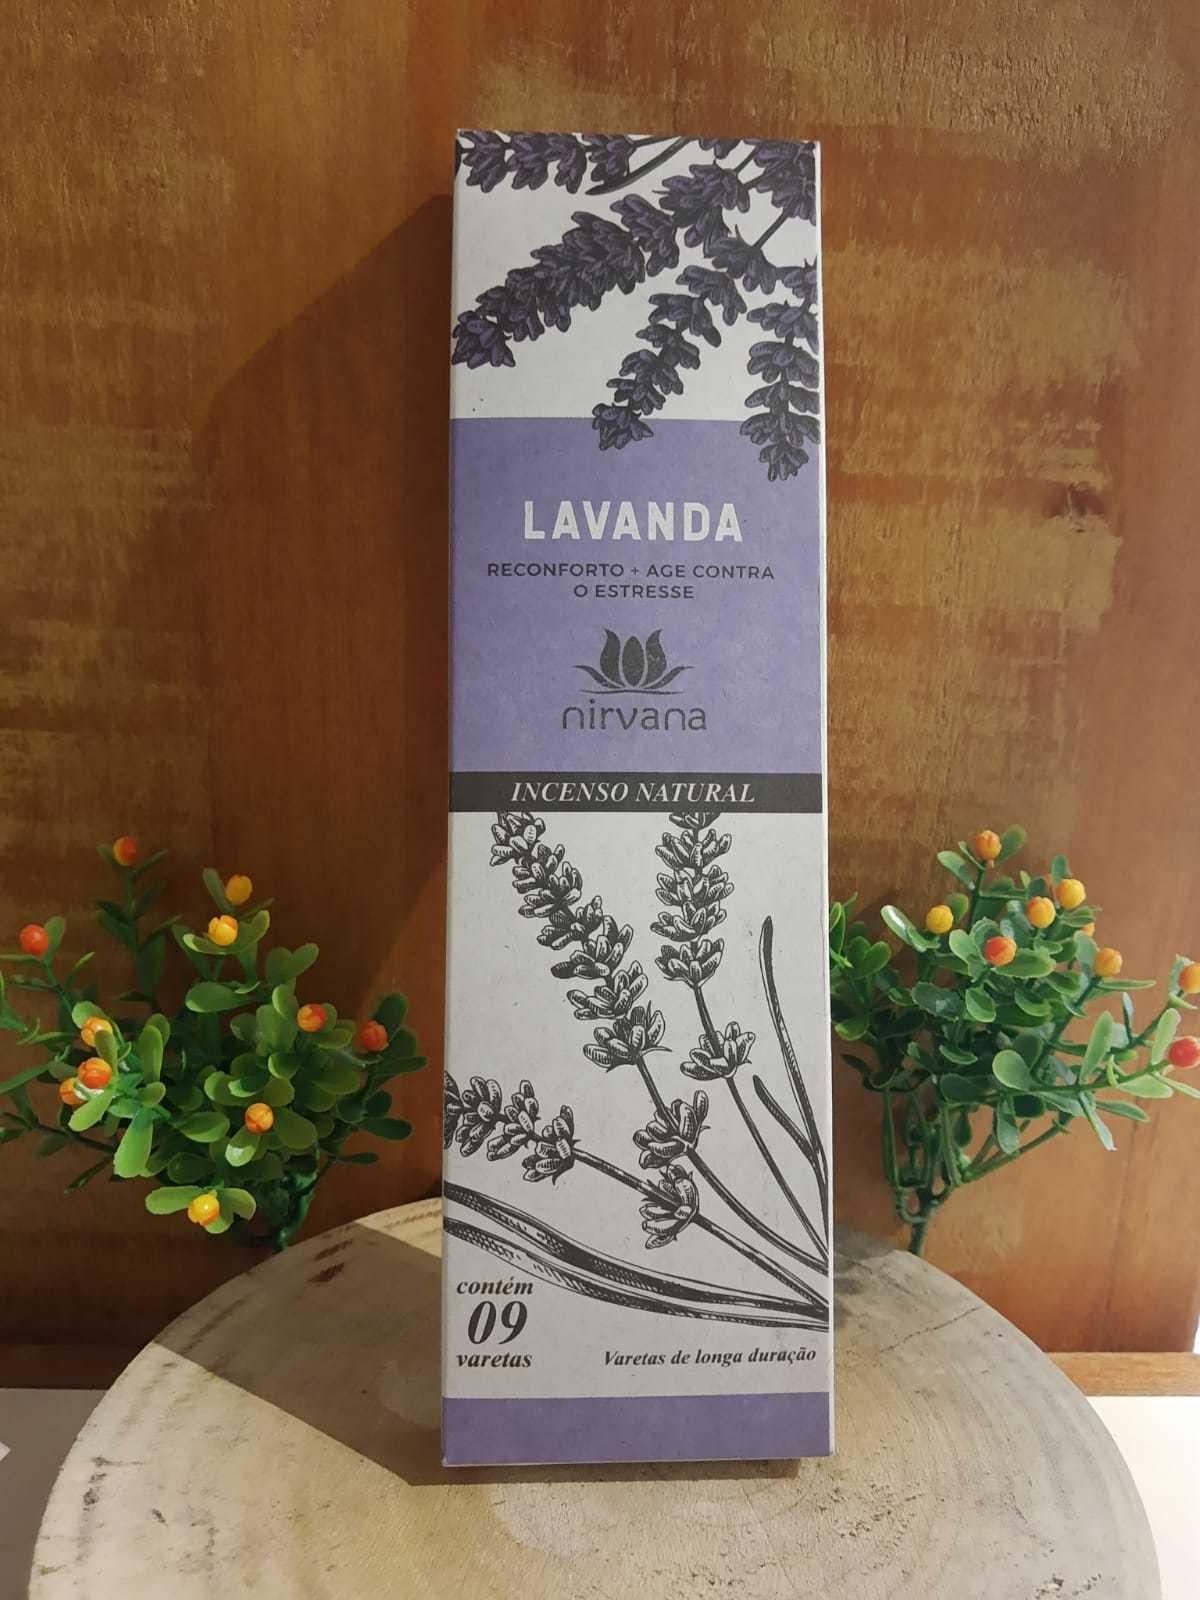 Incenso natural Lavanda - Nirvana